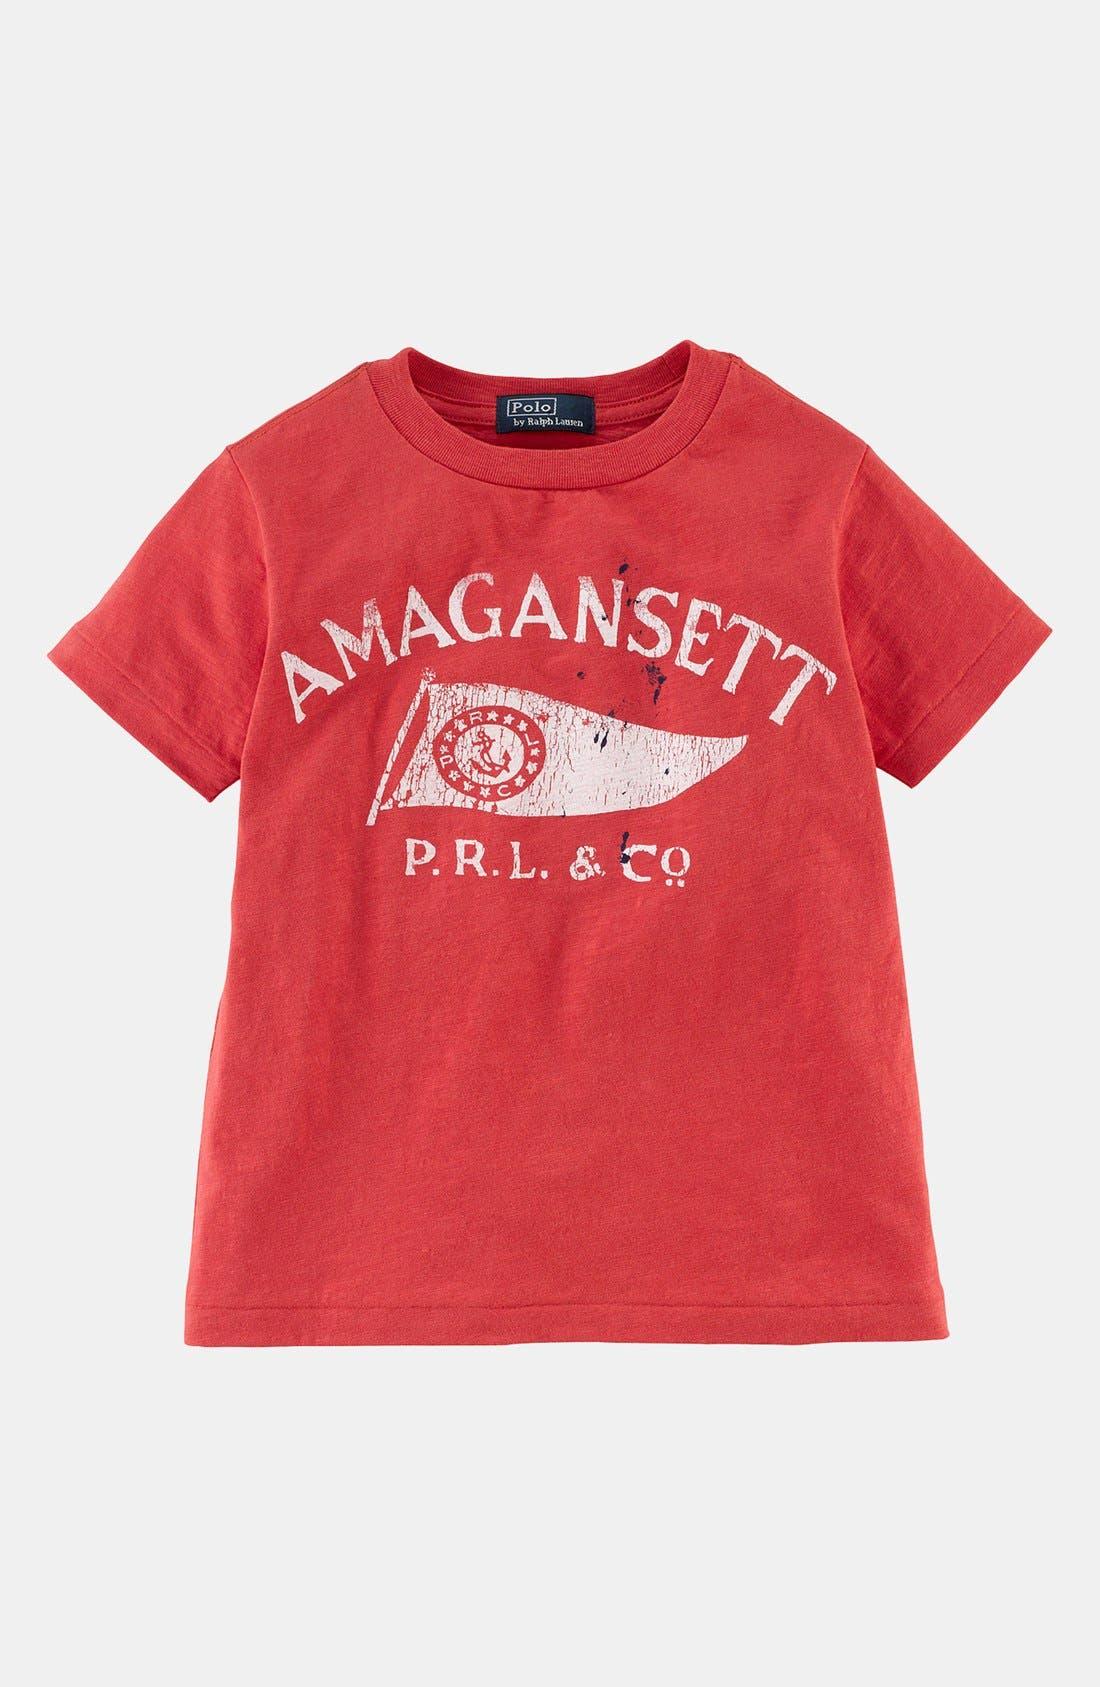 Alternate Image 1 Selected - Ralph Lauren Graphic T-Shirt (Toddler Boys)